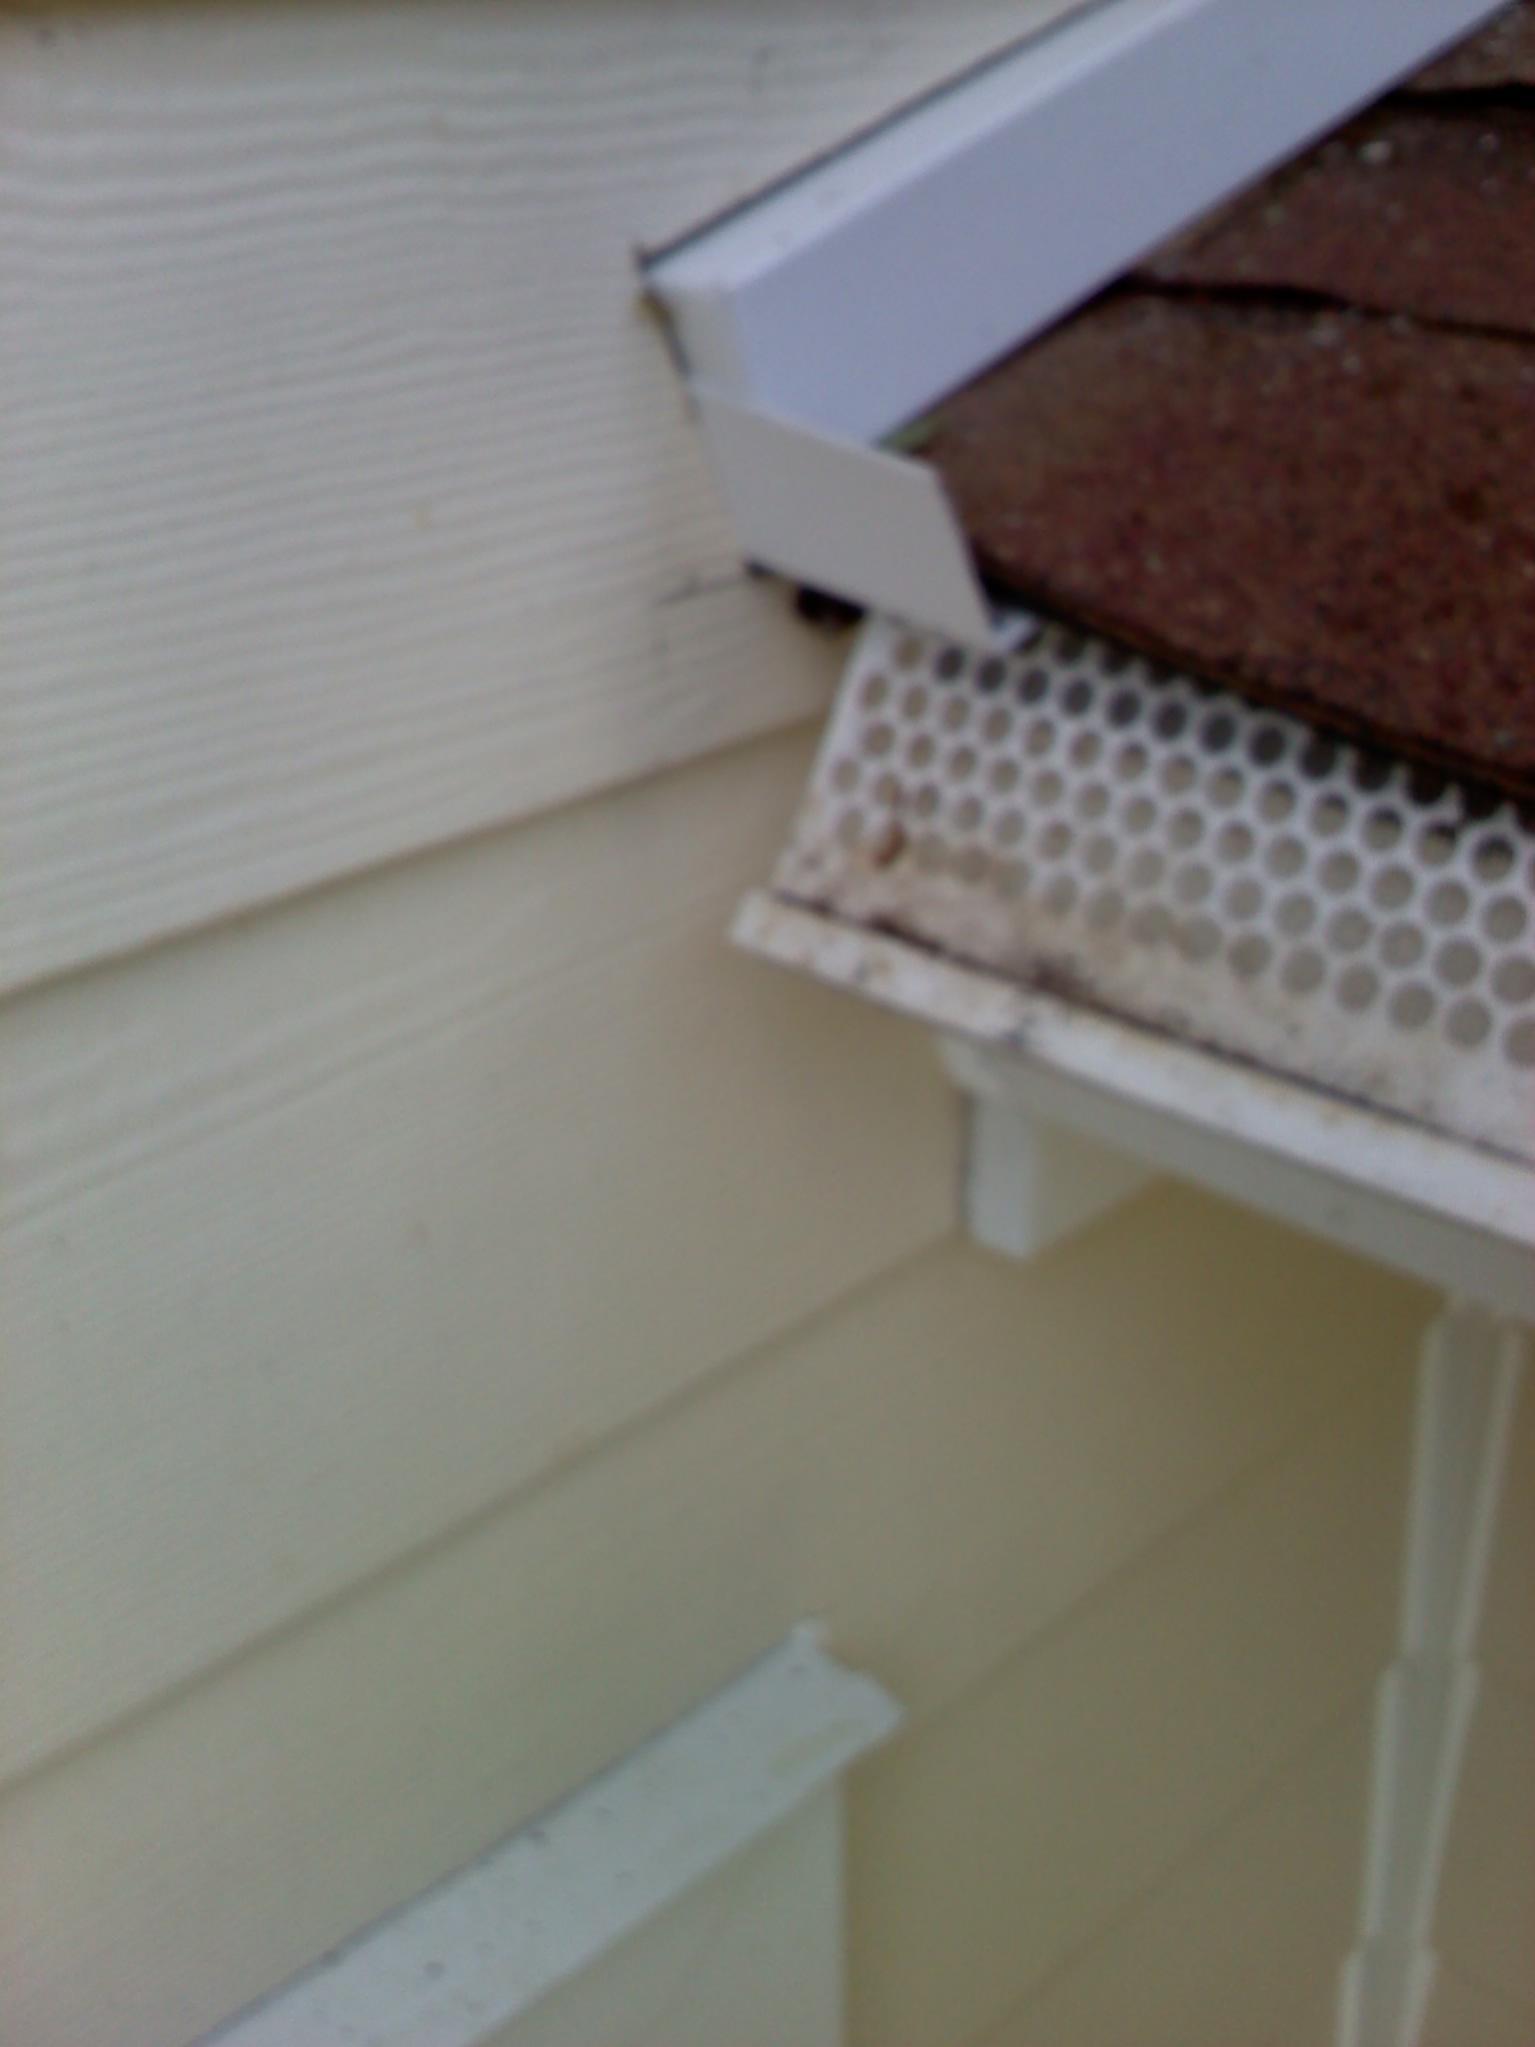 Leaking Windows Windows Siding And Doors Contractor Talk